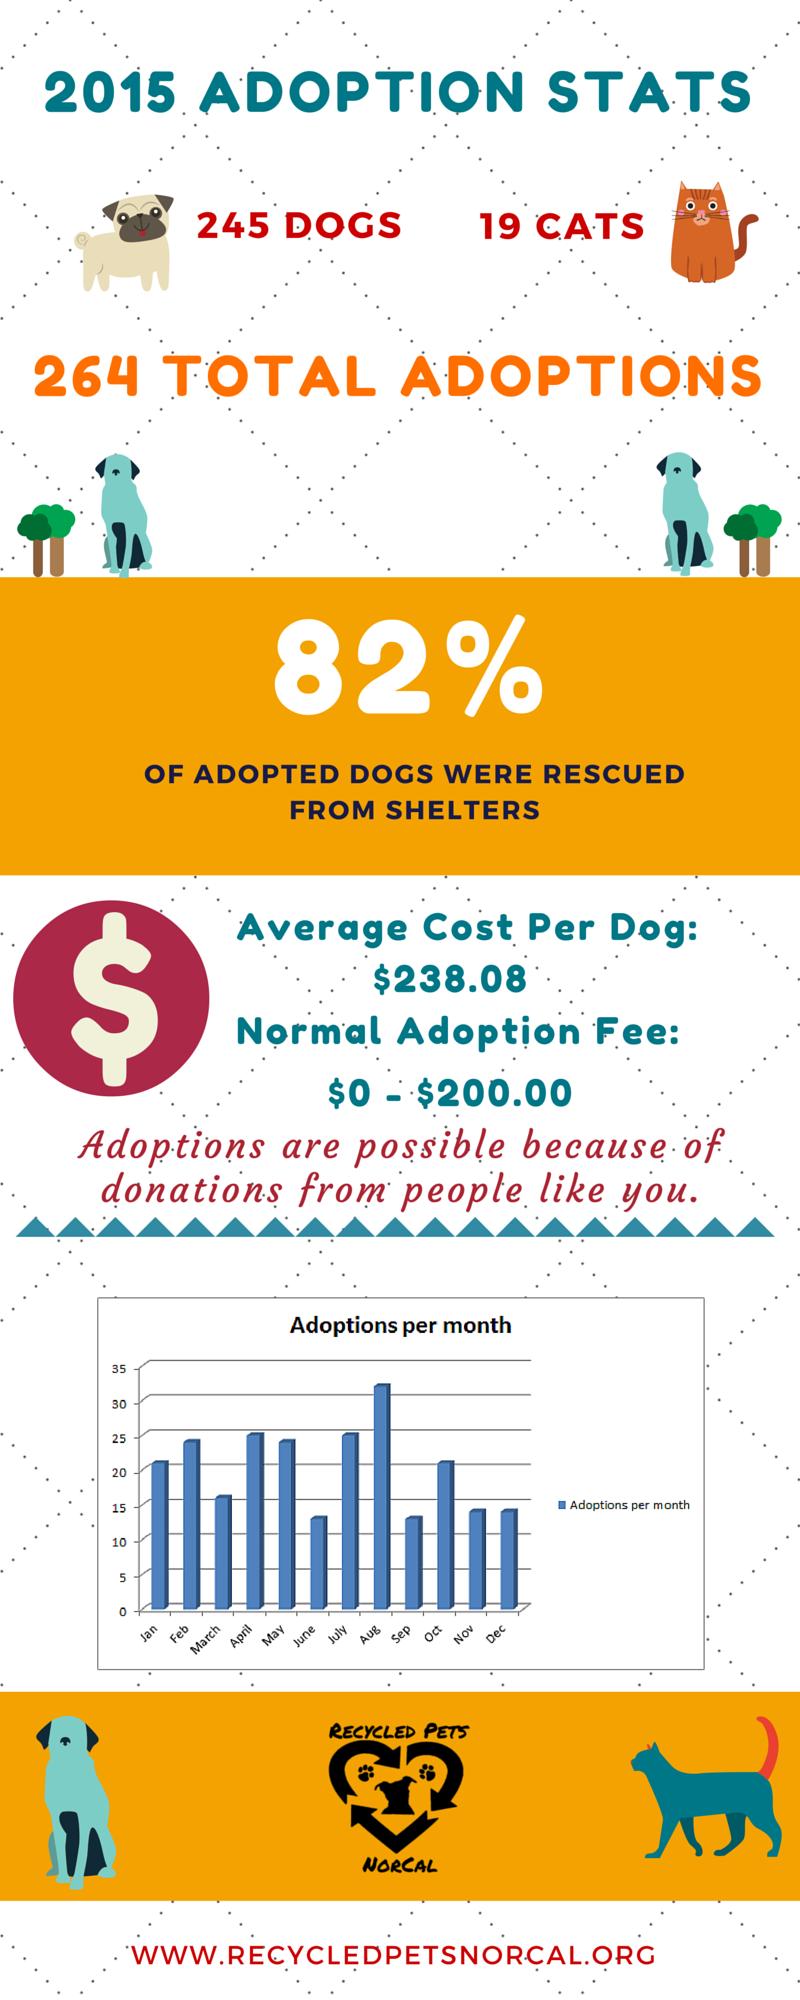 2015 Adoption Stats